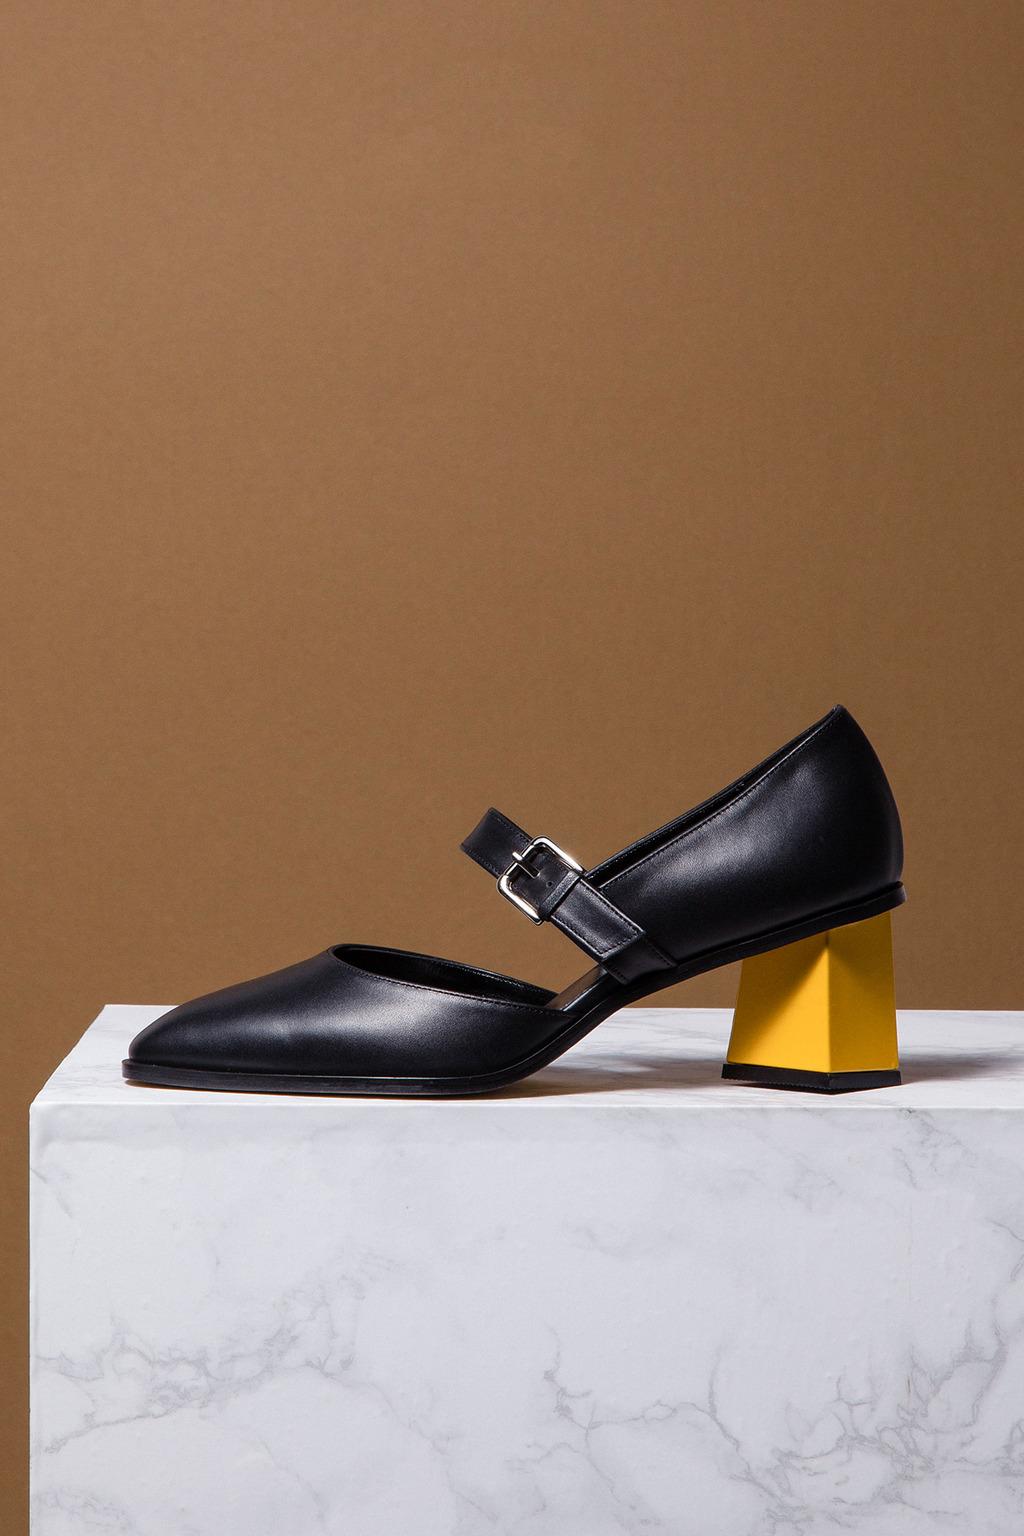 DORATORE Serio - Women's Shoes : Republic of Korea